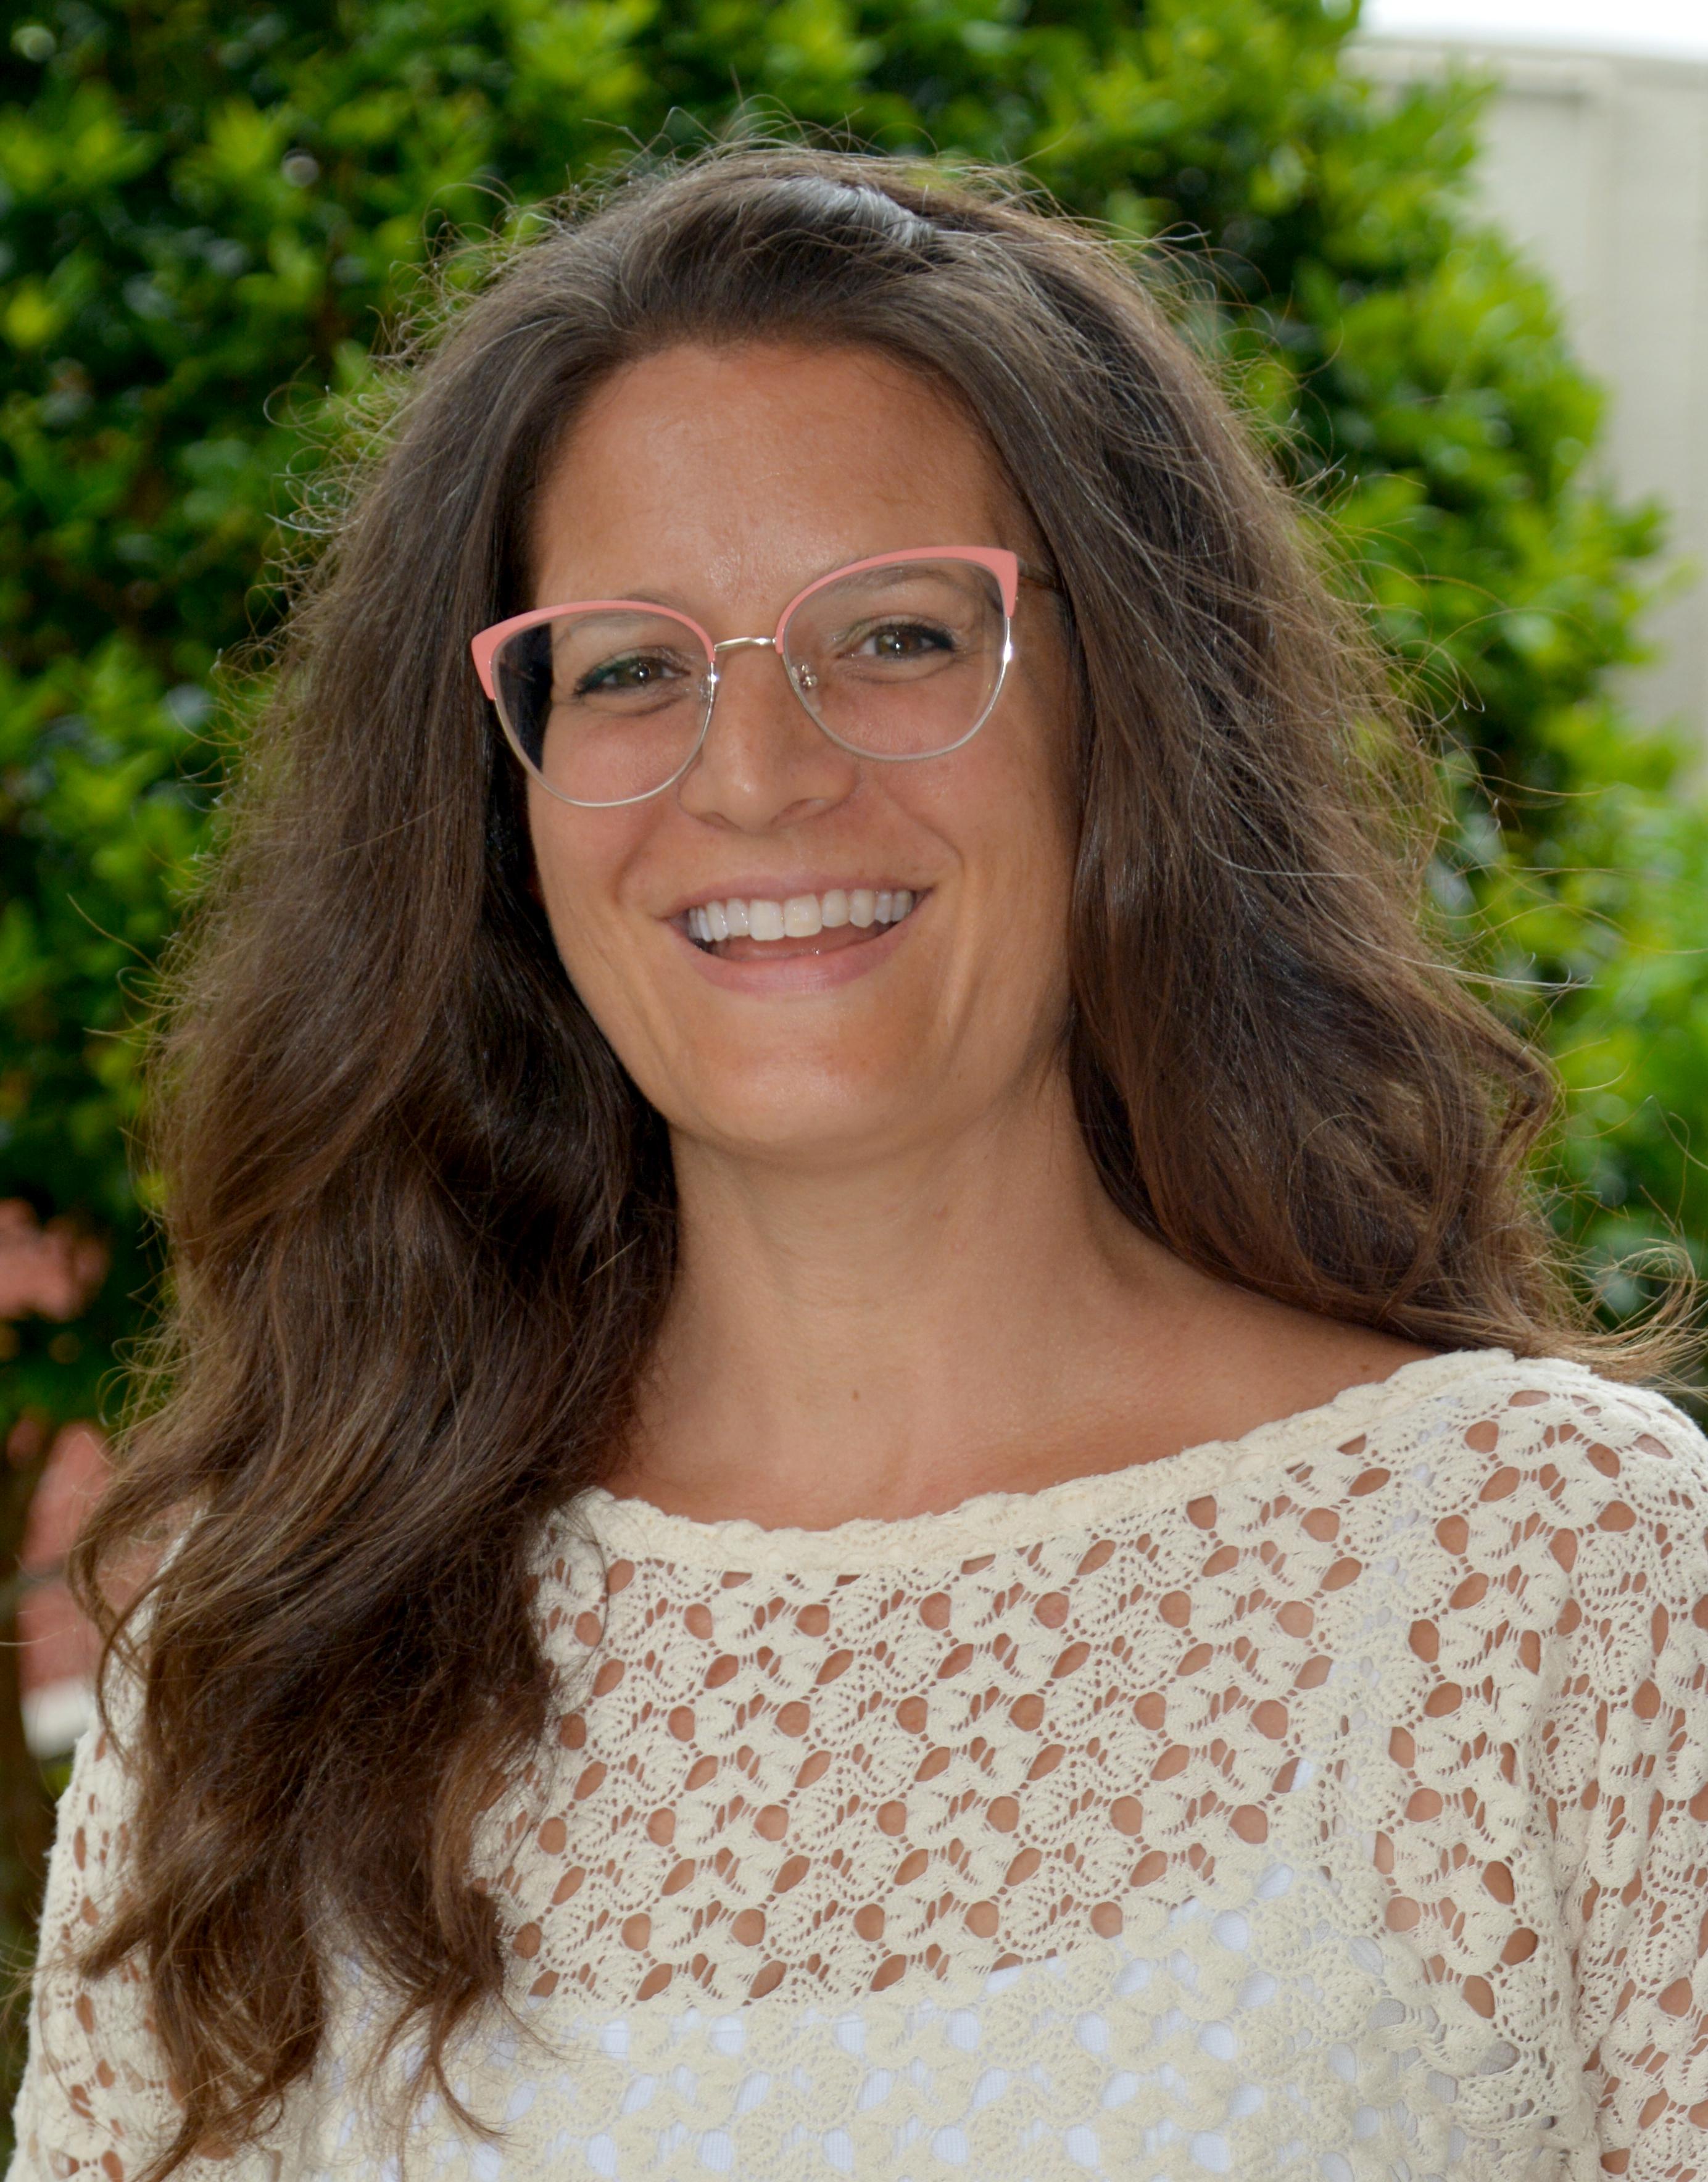 Katy Picon